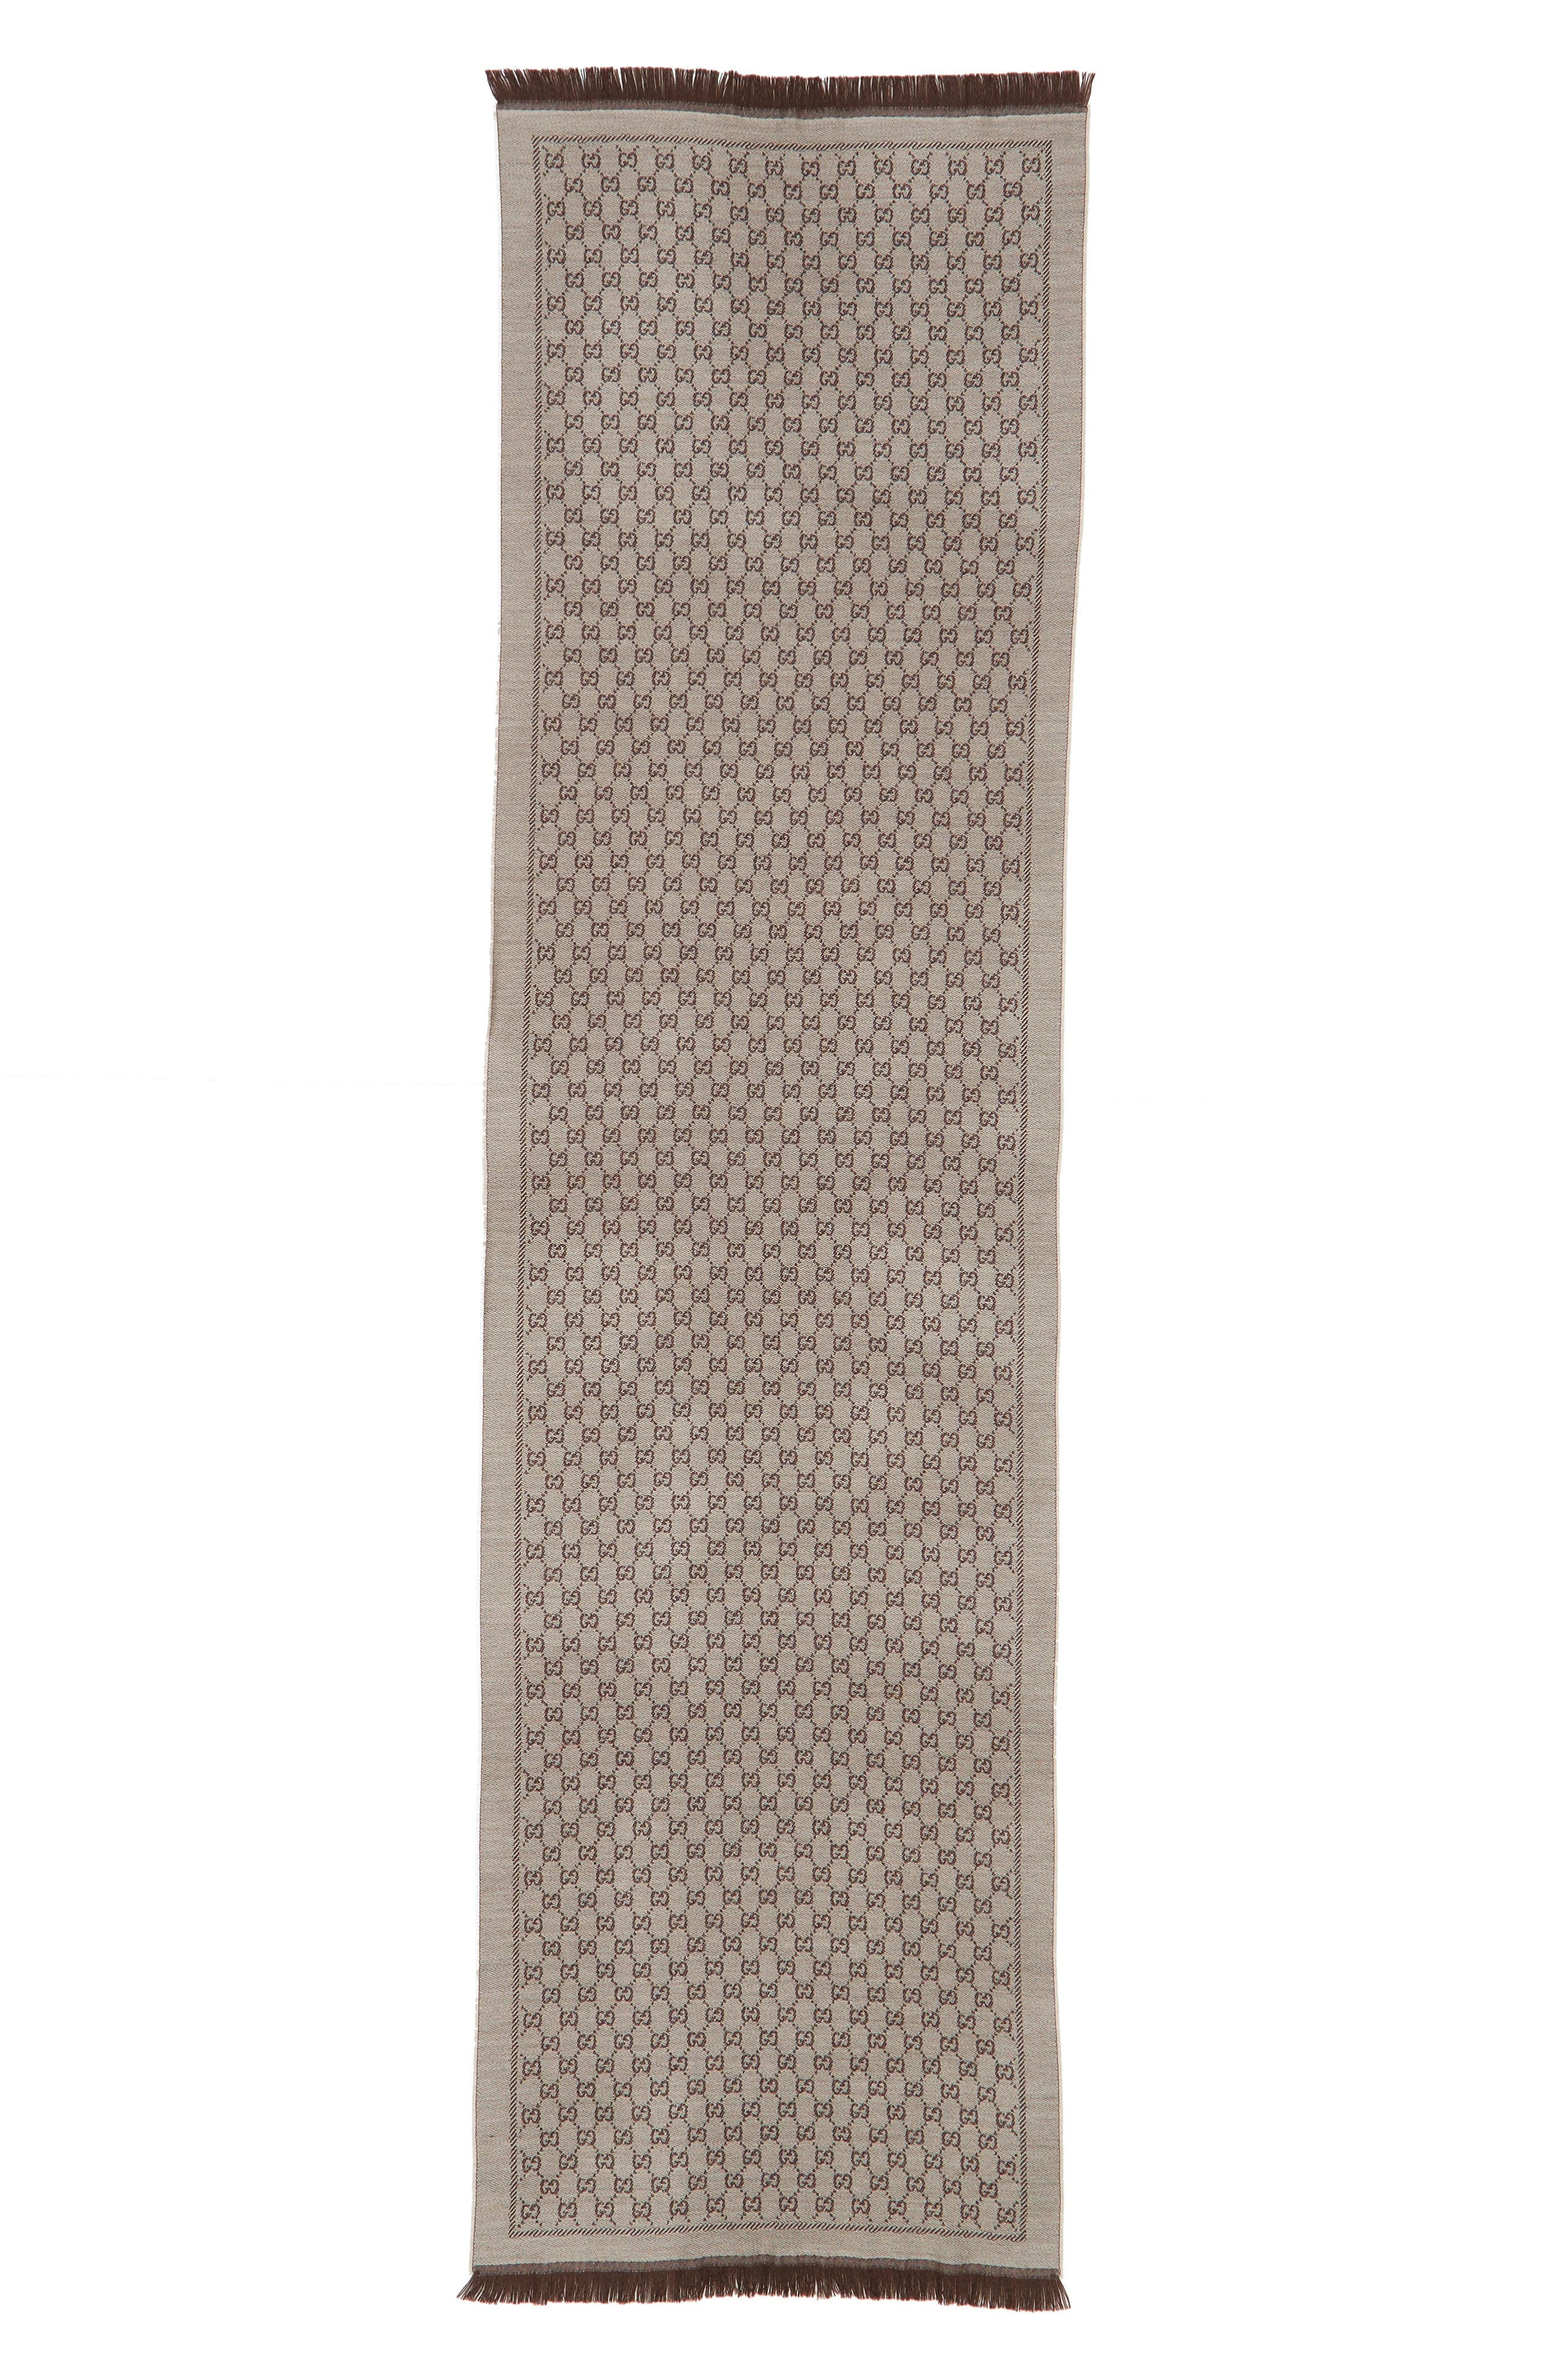 GG Jacquard Wool Scarf,                         Main,                         color, BEIGE/ DARK BROWN